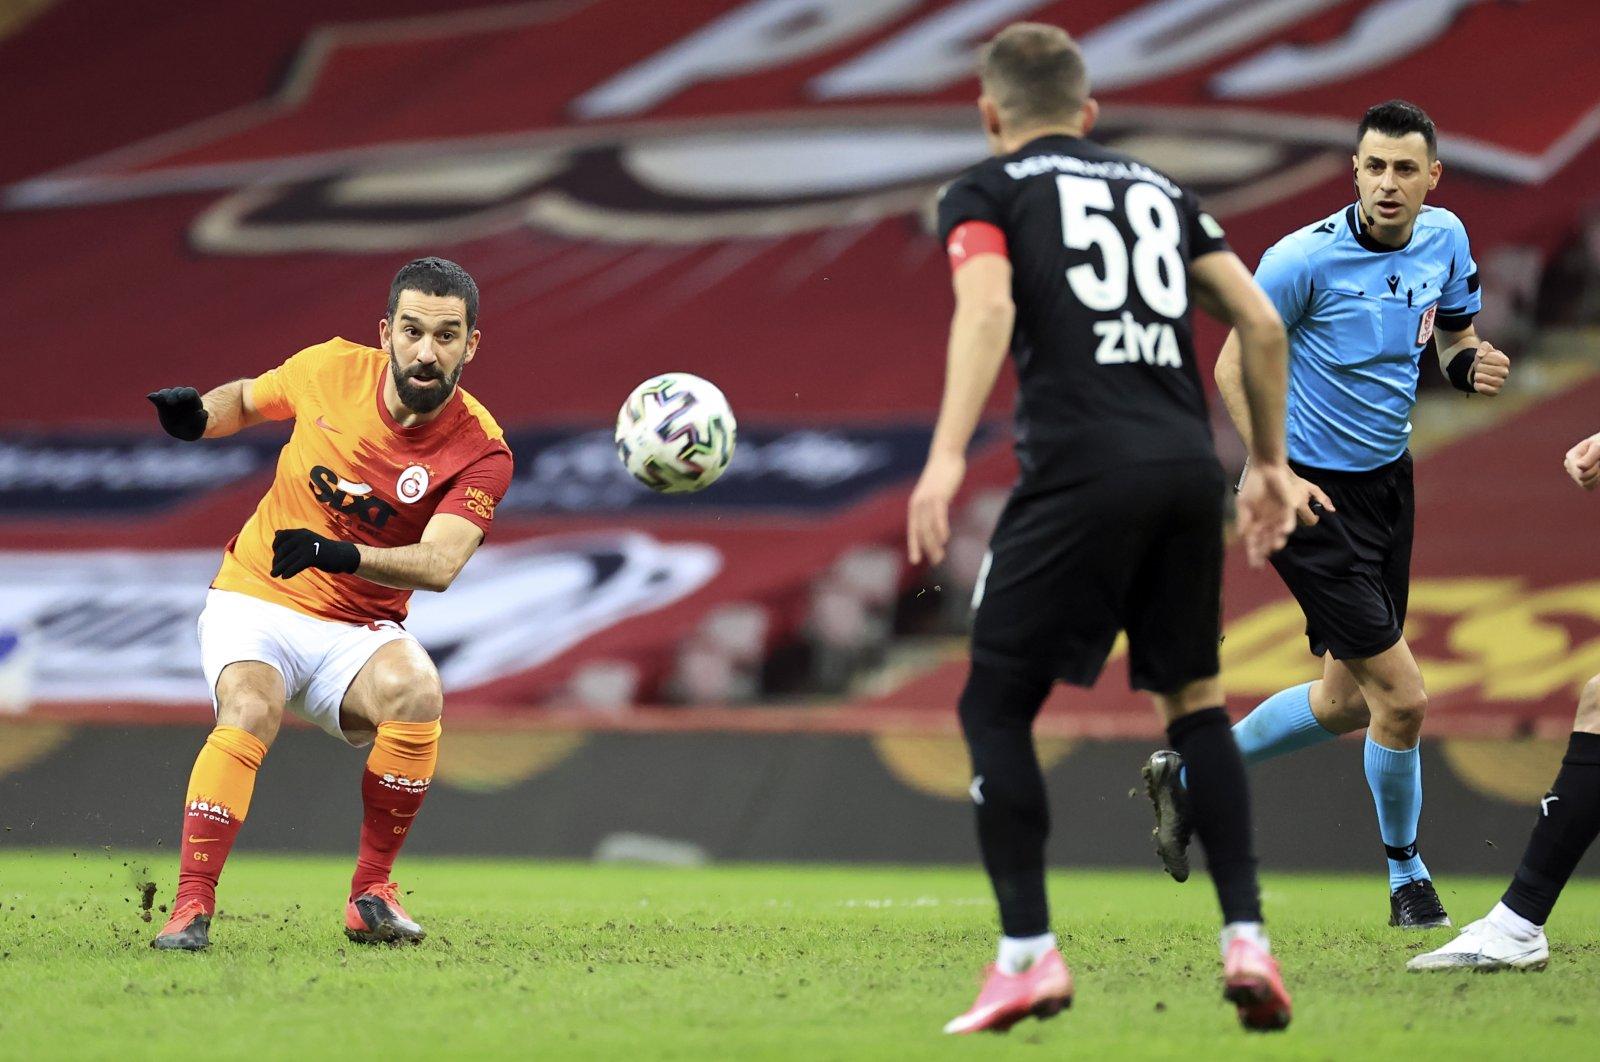 Galatasaray's Arda Turan (L) shoots as Sivasspor's Ziya Erdal (R) looks on during a Turkish Süper Lig match at theTürk Telekom Stadium, Istanbul, Turkey, March 8, 2021. (AA Photo)